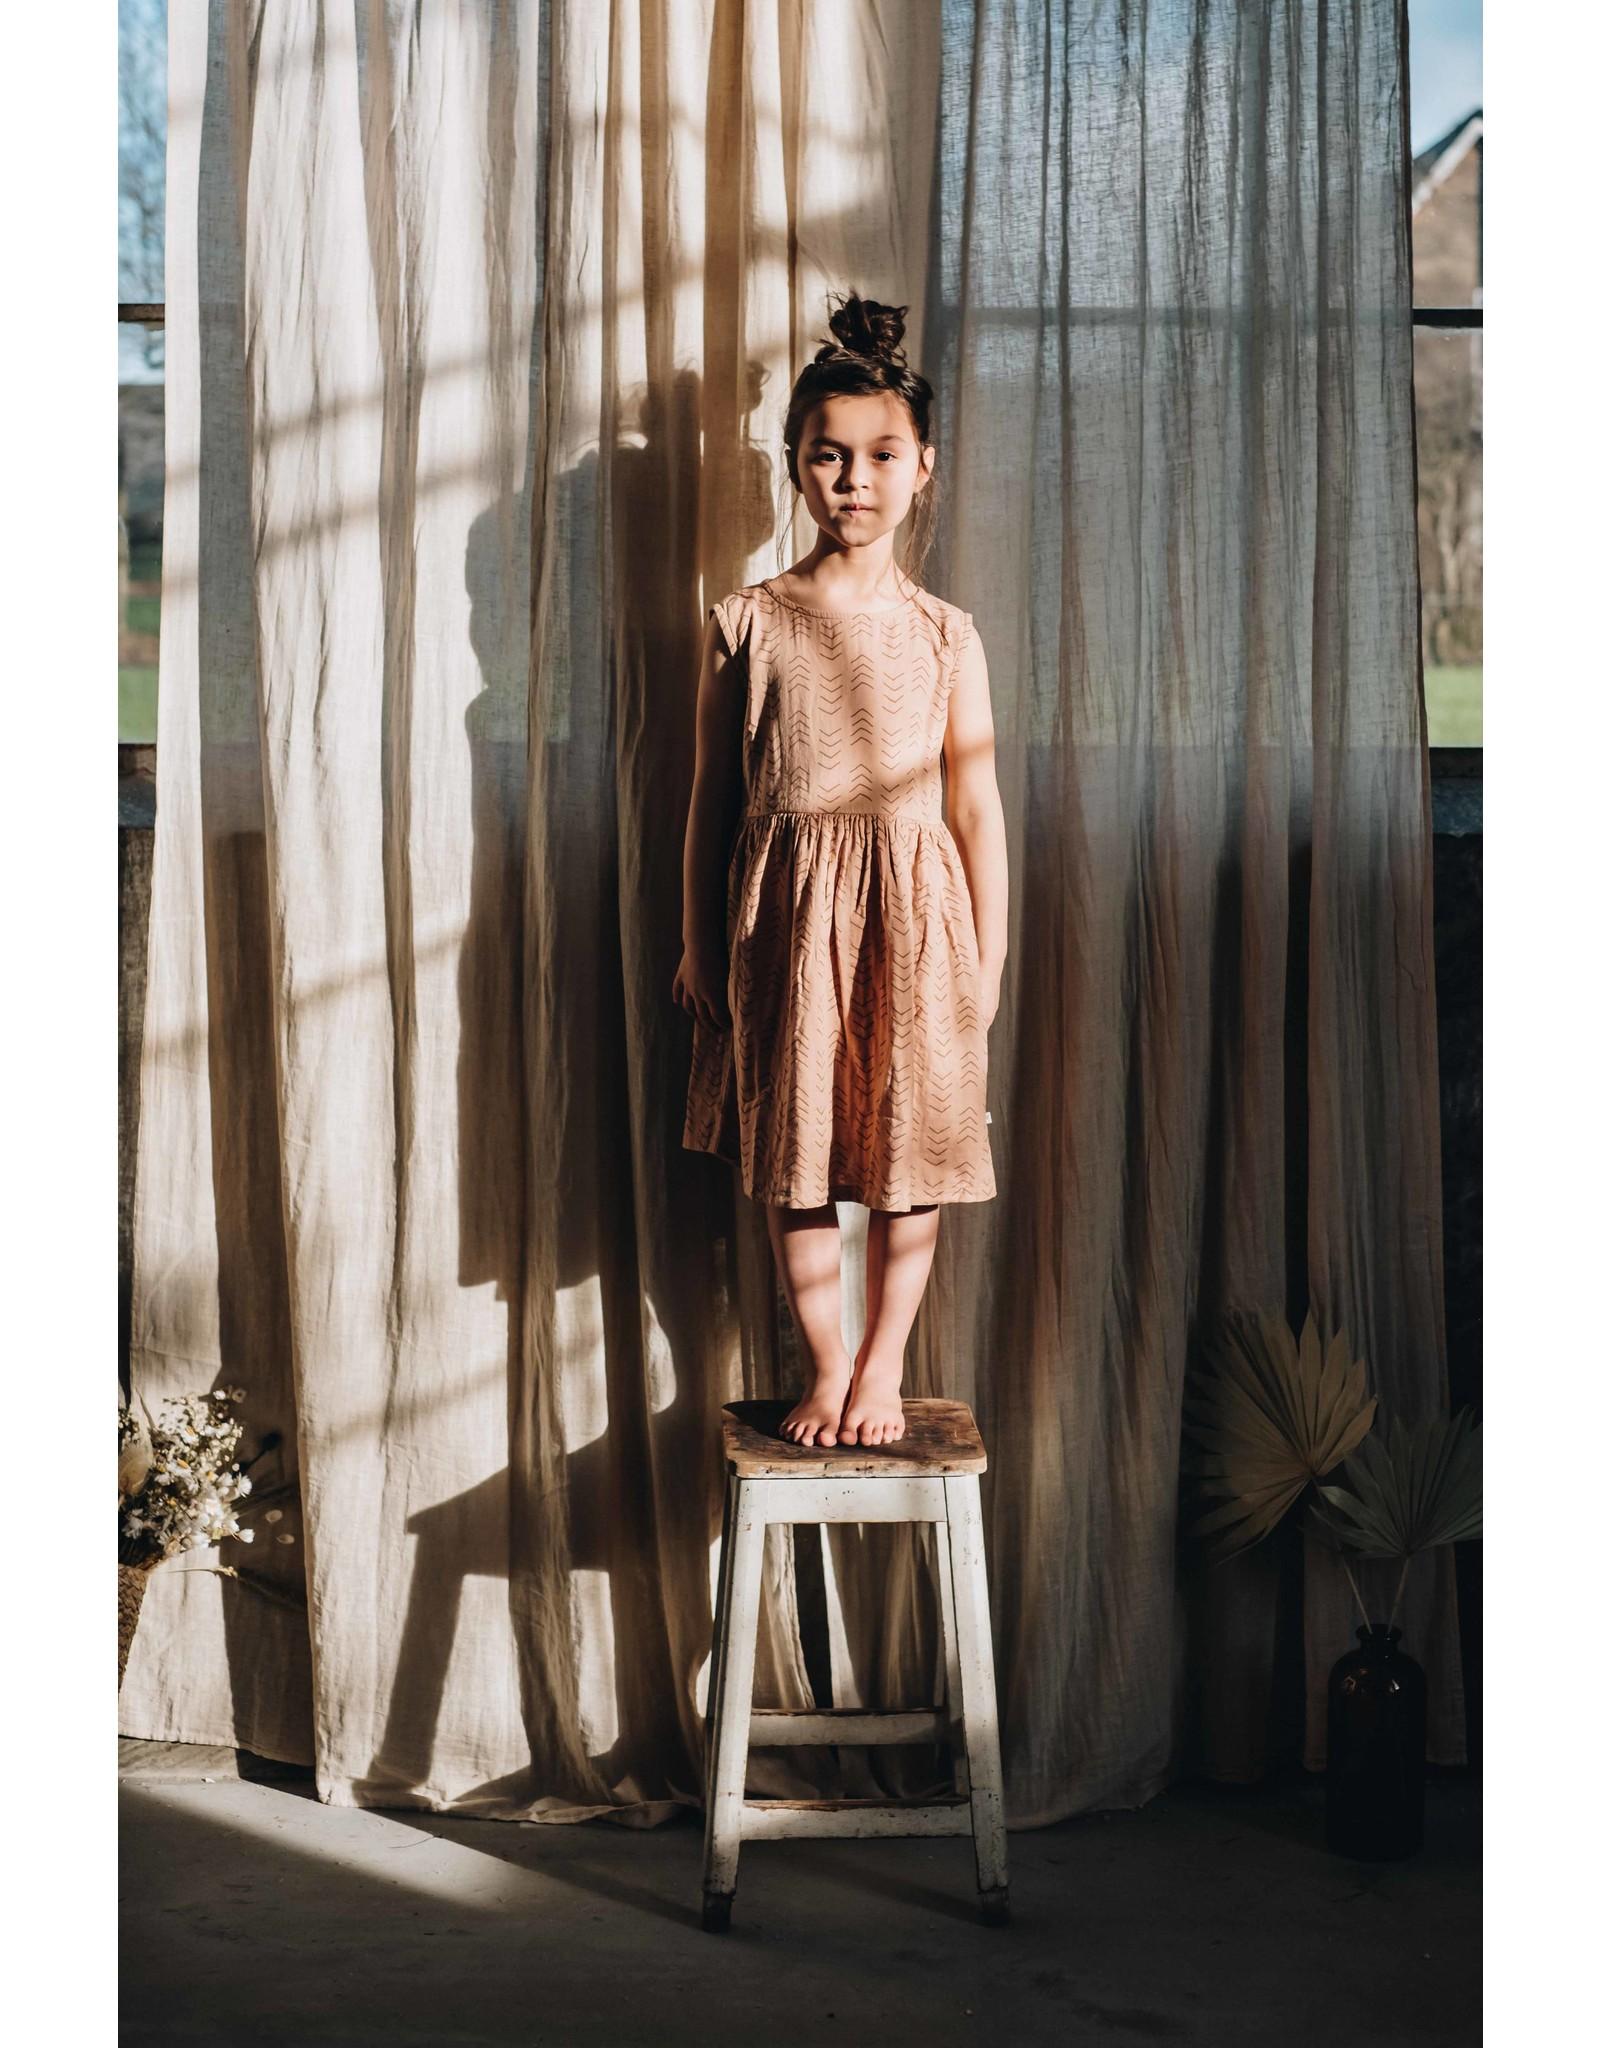 Blossom Kids BK - Summer dress - Arrow Harmony